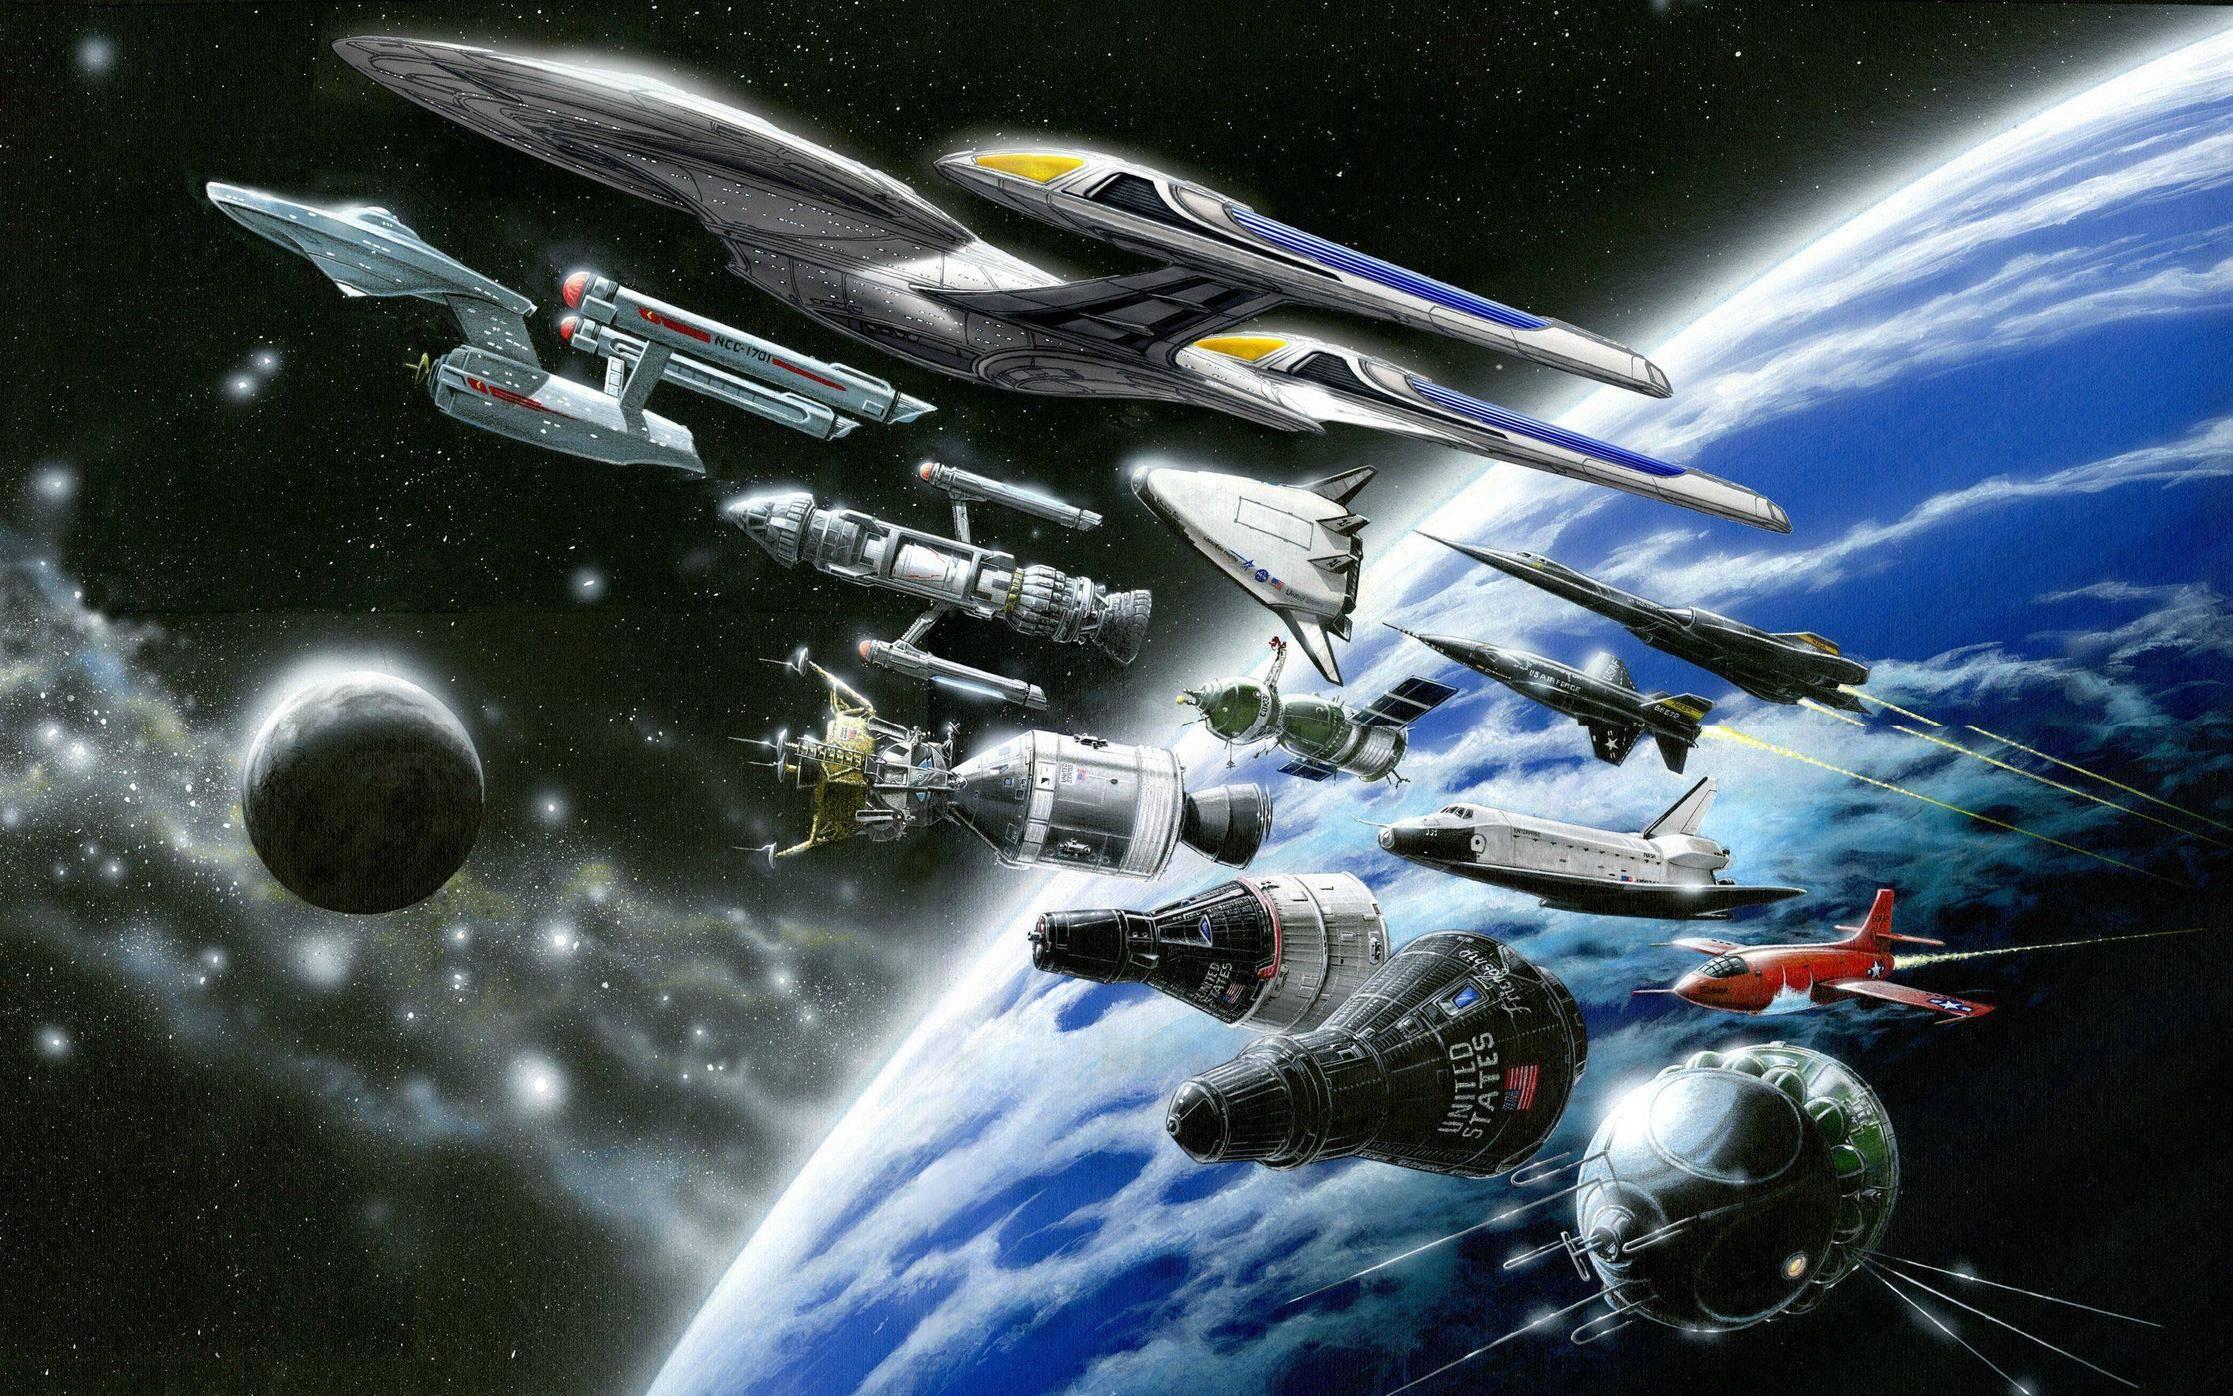 Star Trek Starship Enterprise Spaceship NASA Shuttle Drawing Stars 2233x1396